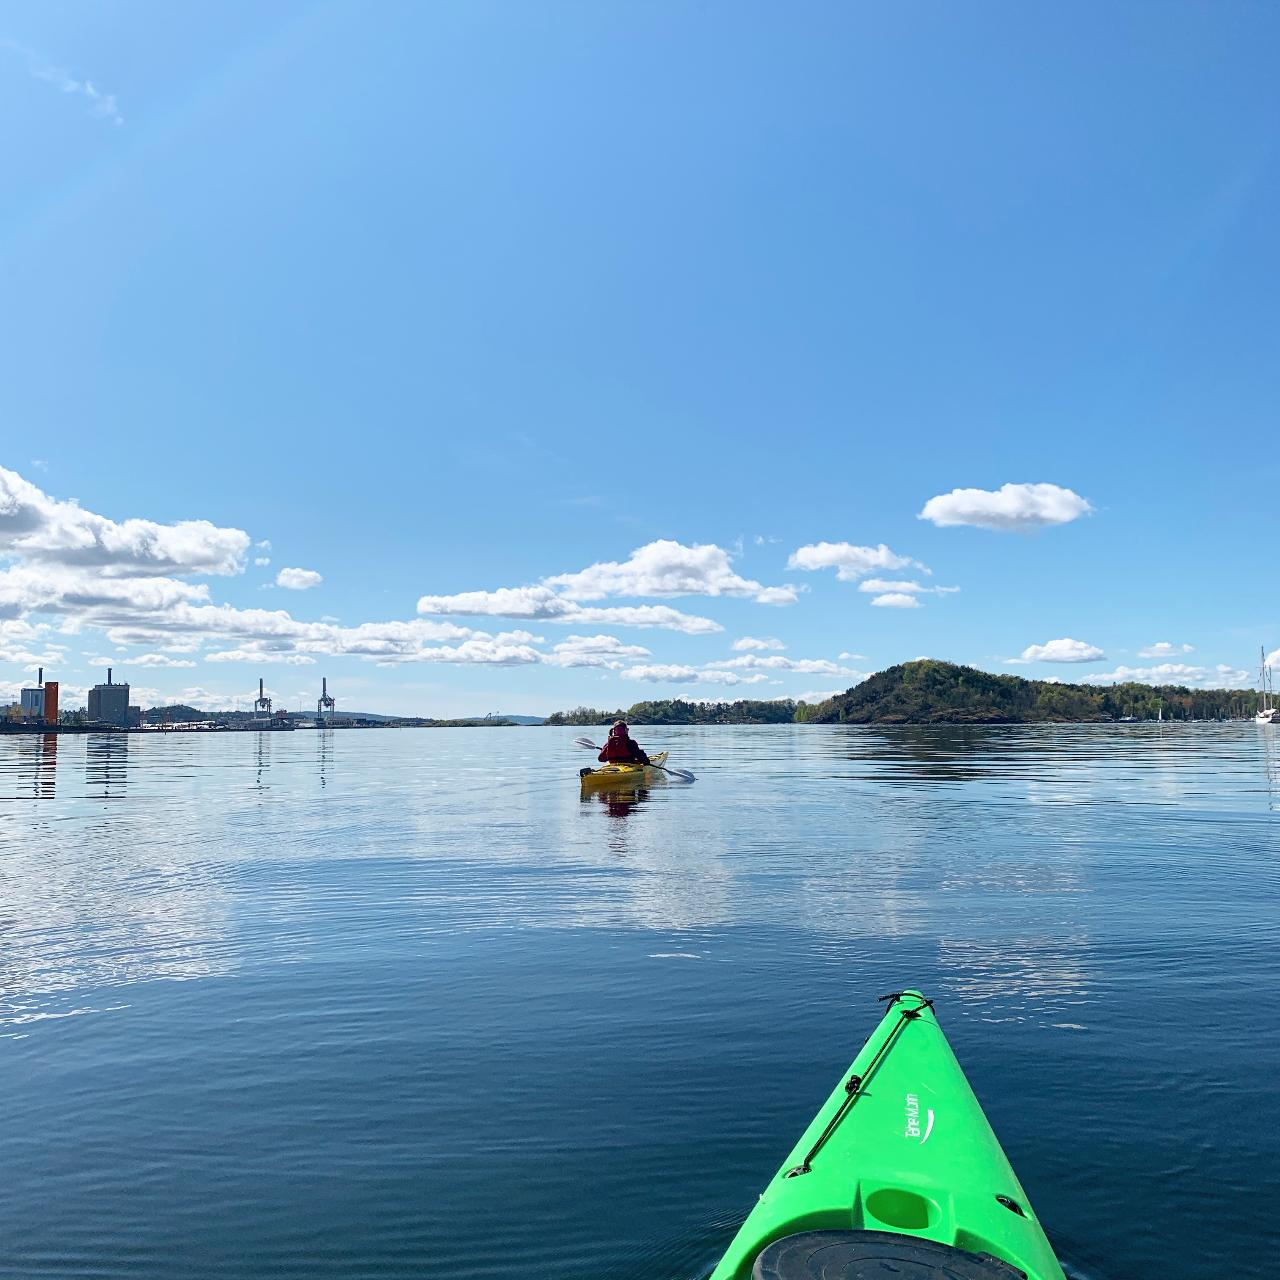 Sea Kayaking - Refresher Course - Aker Brygge